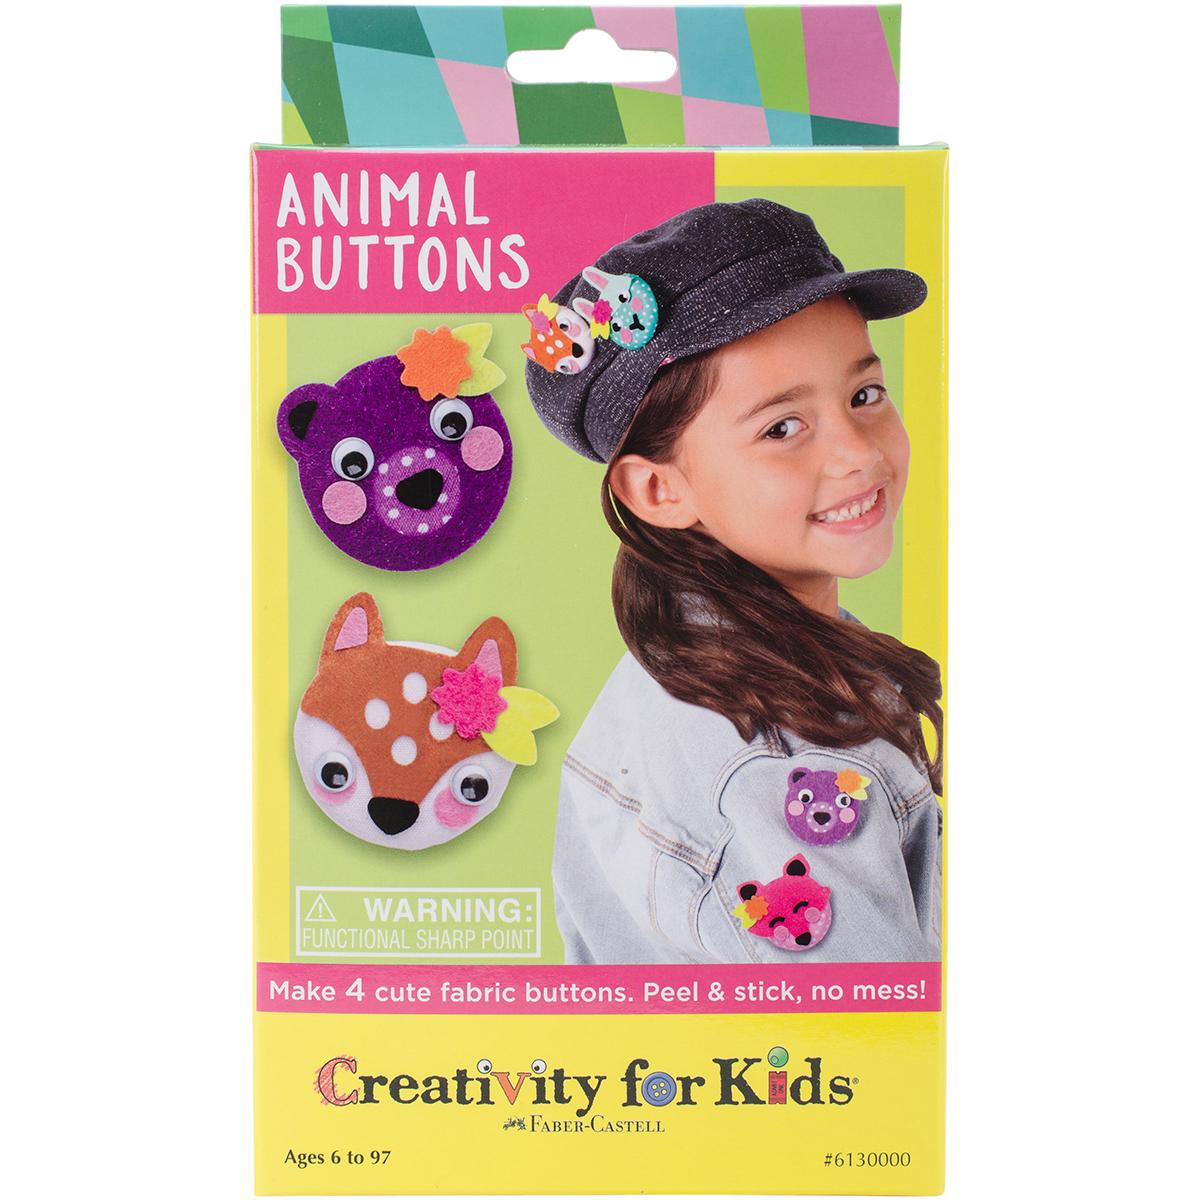 Animal Buttons Mini Kit-Makes 4